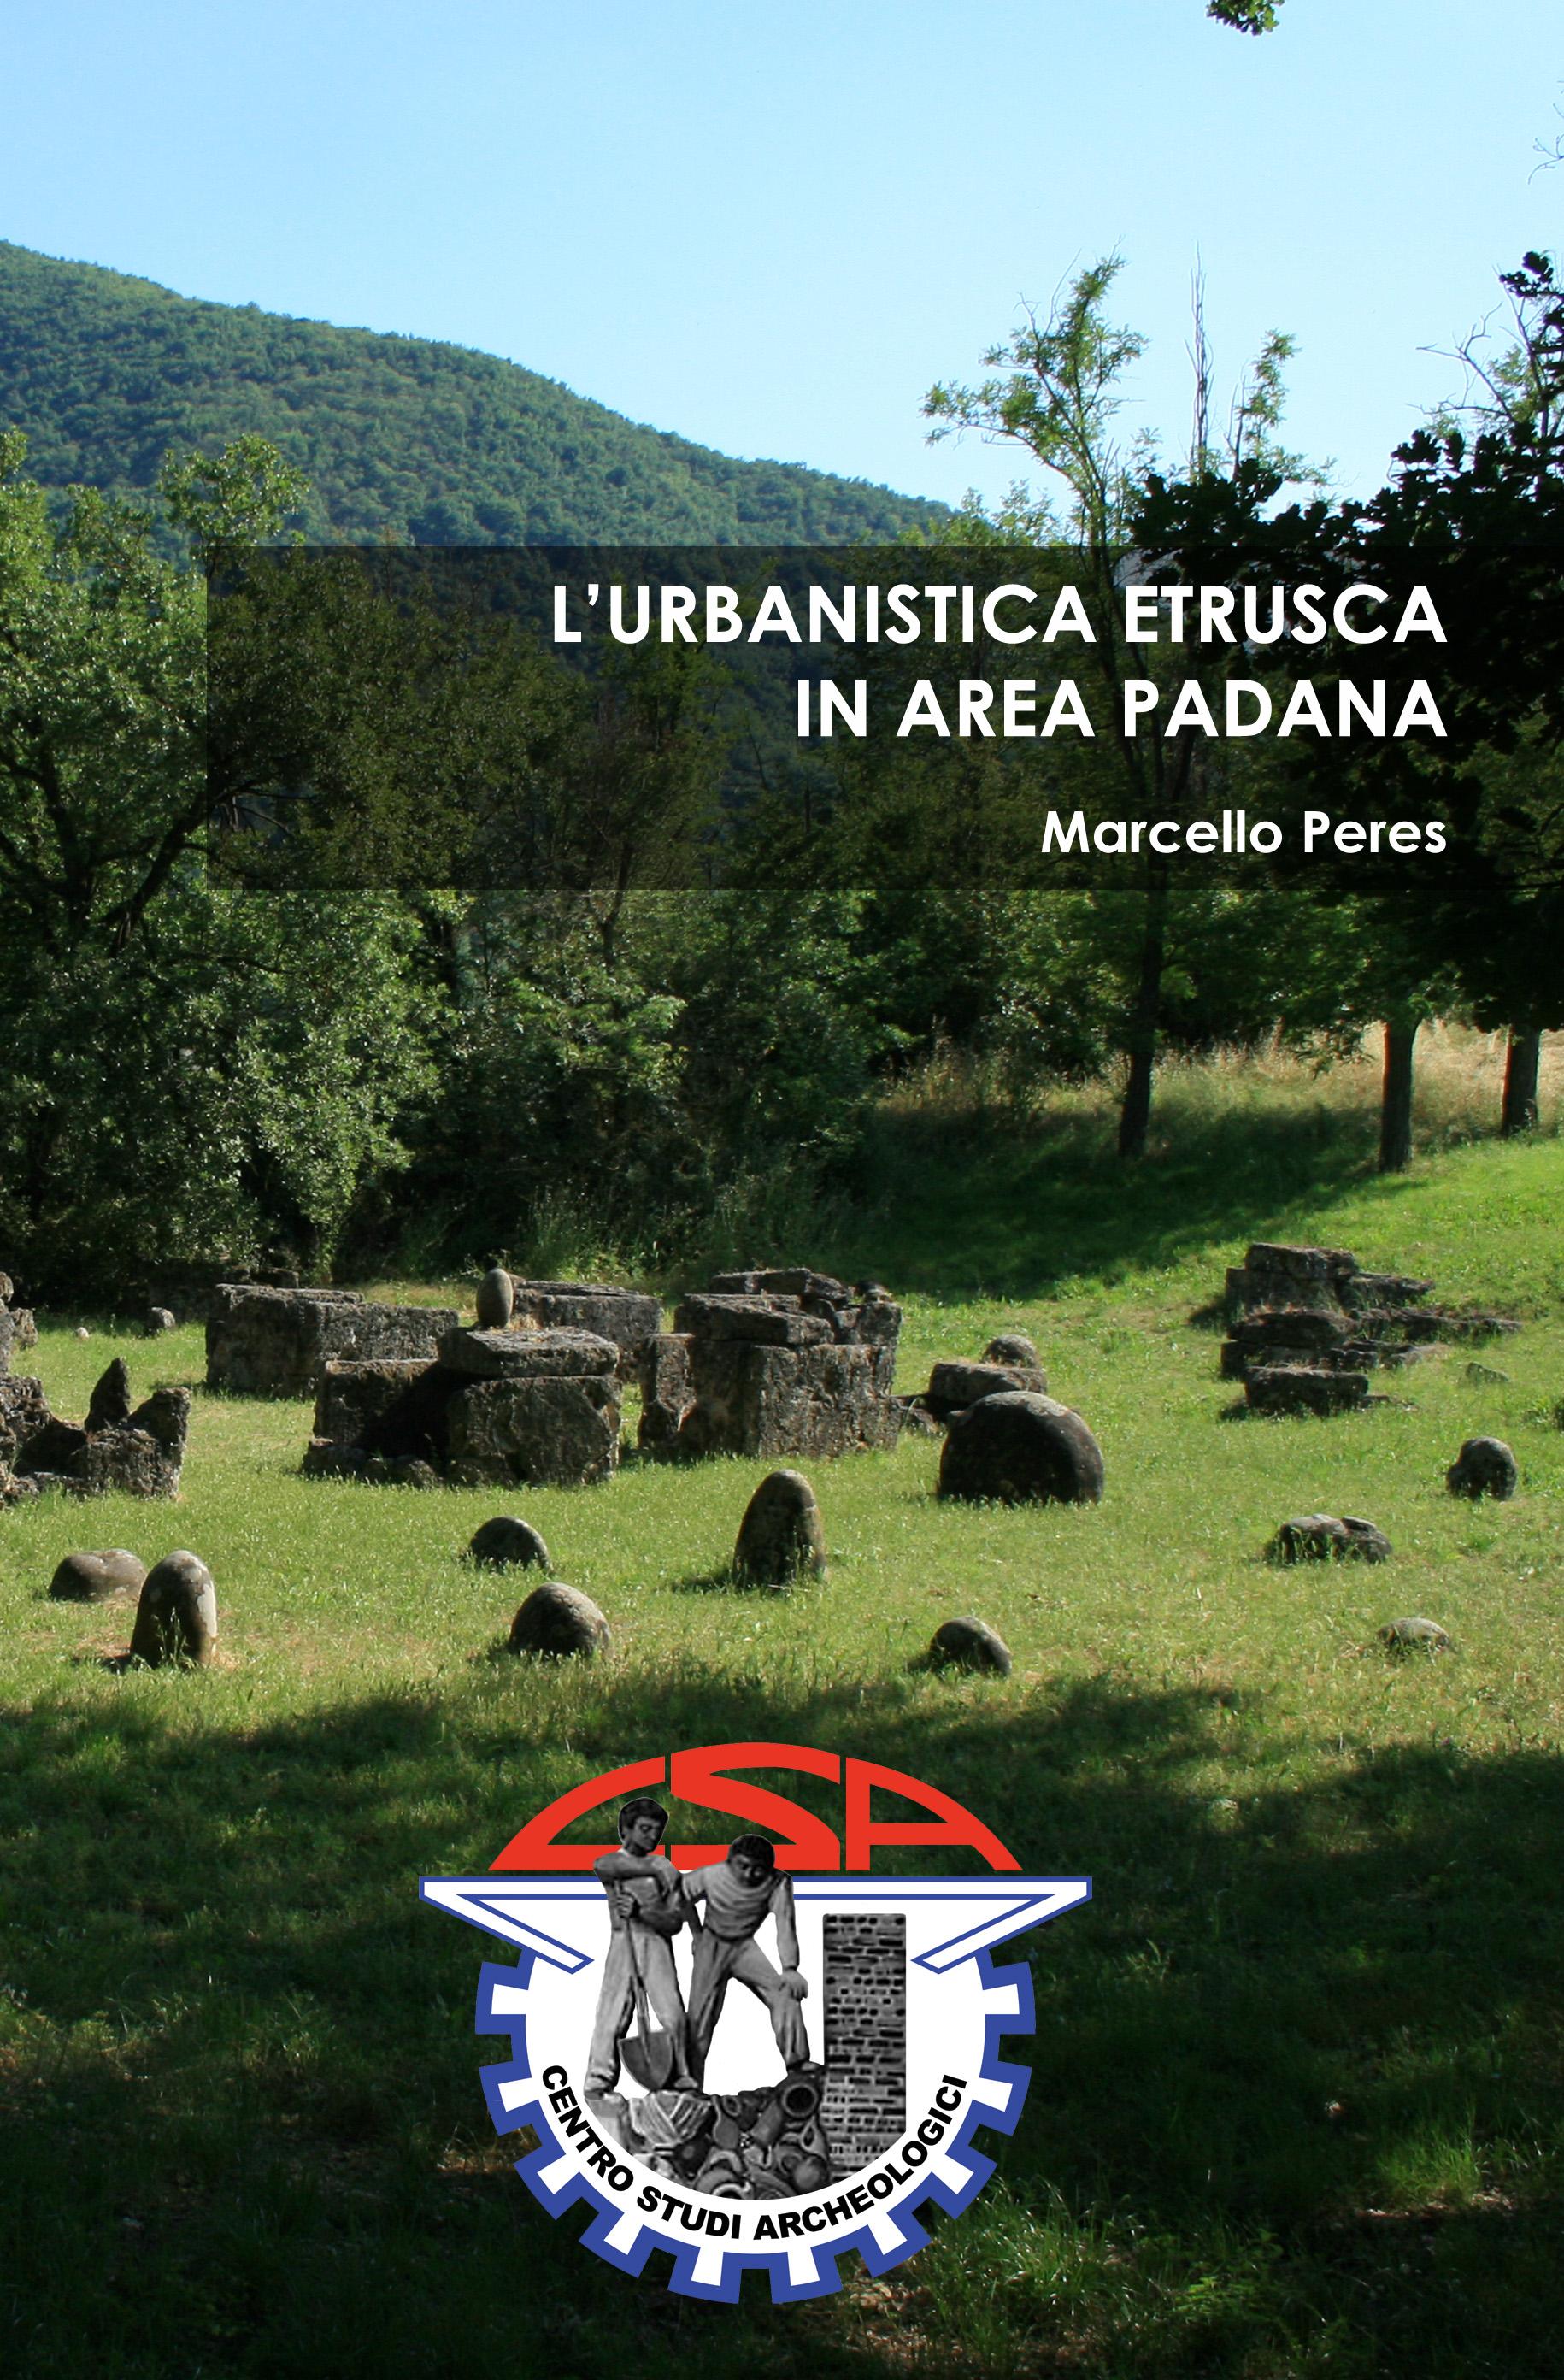 L'urbanistica etrusca in area padana